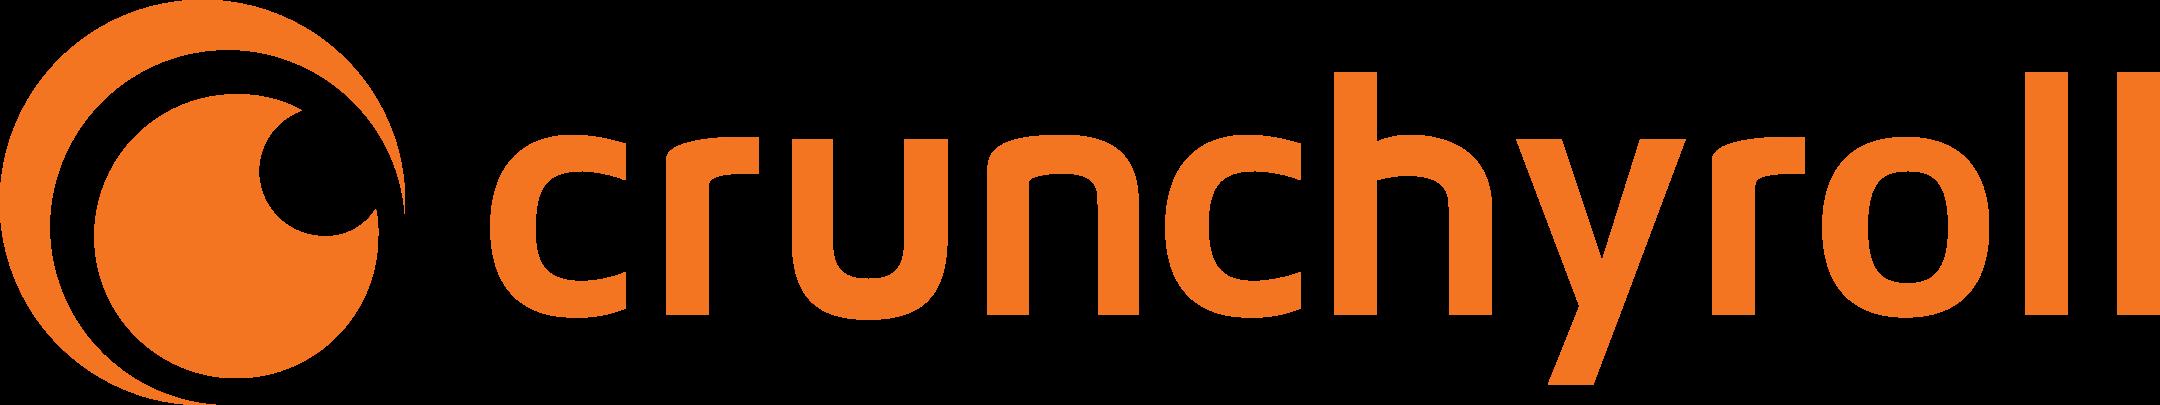 crunchyroll logo 1 - Crunchyroll Logo